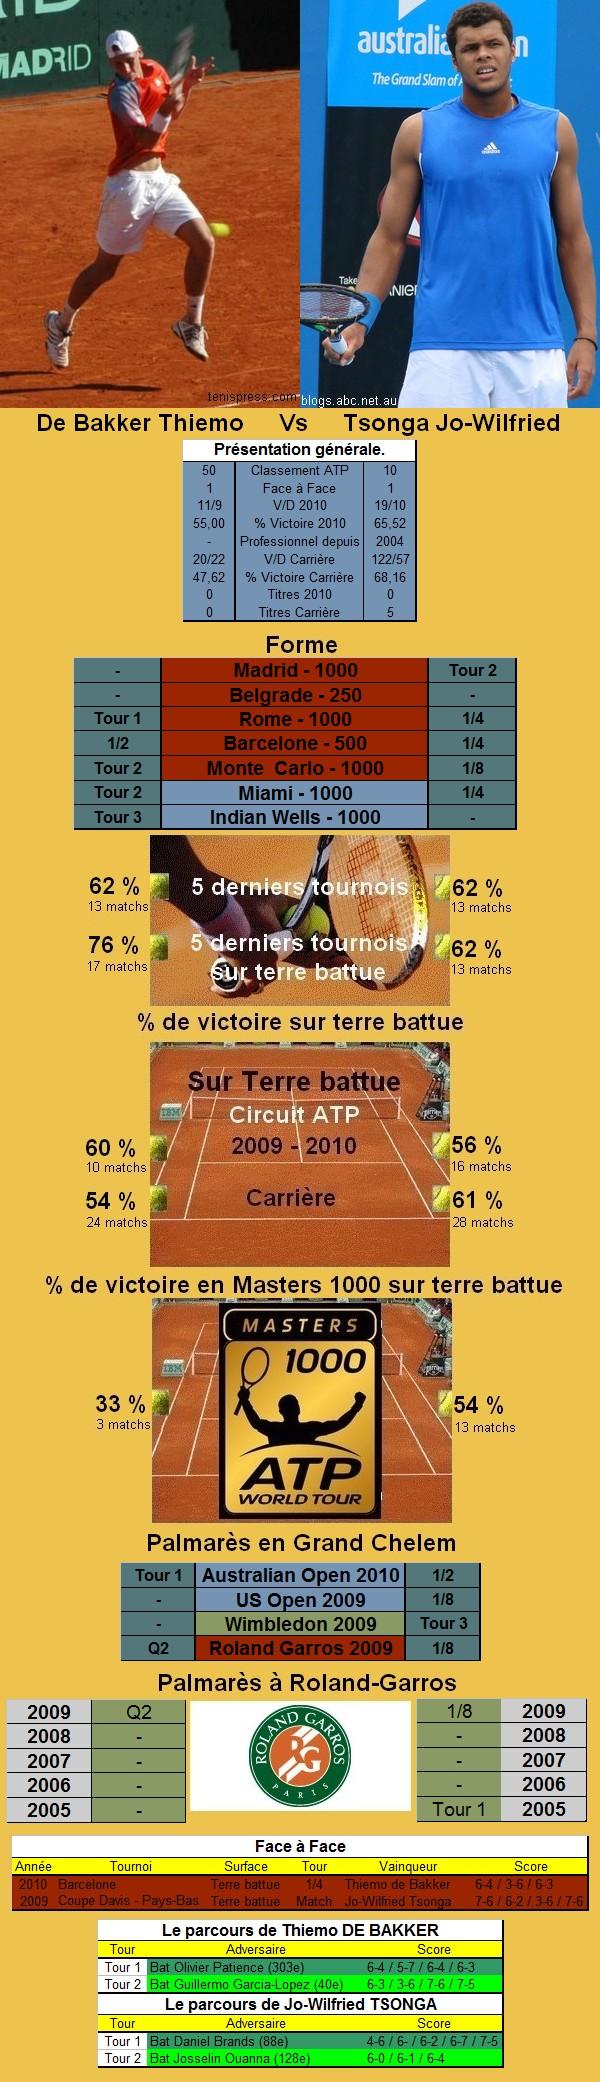 Statistiques tennis de de Bakker contre Tsonga à Roland Garros